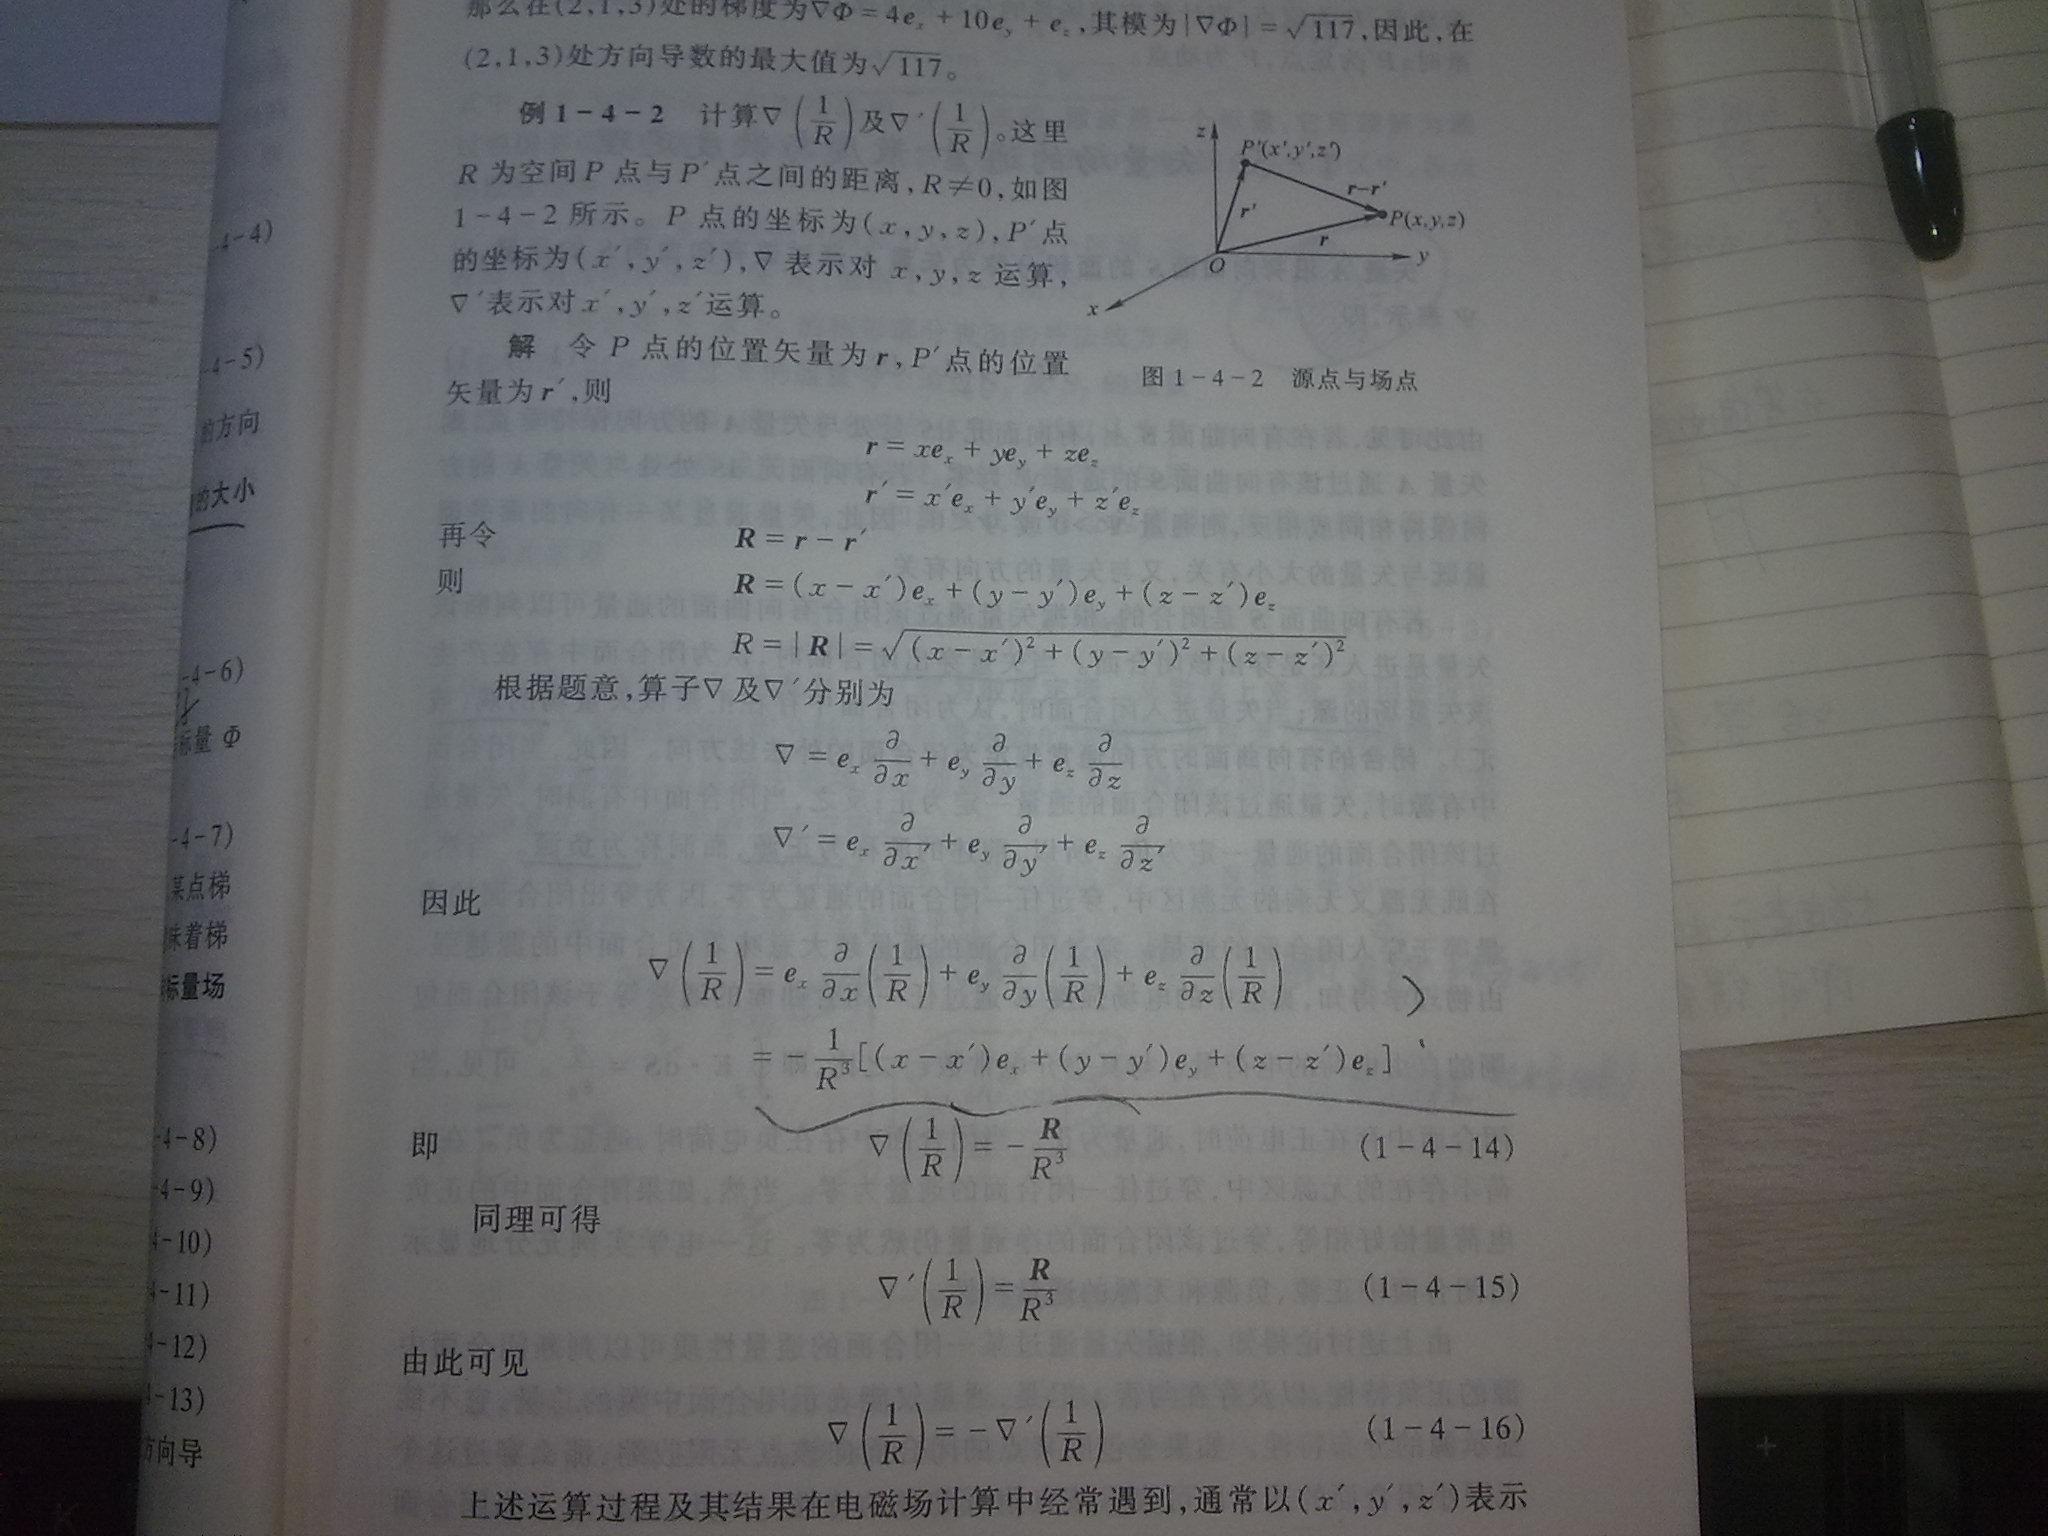 5oi35aSW6L Q5Yqo_草体字转换图片展示_草体字转换相关图片下载